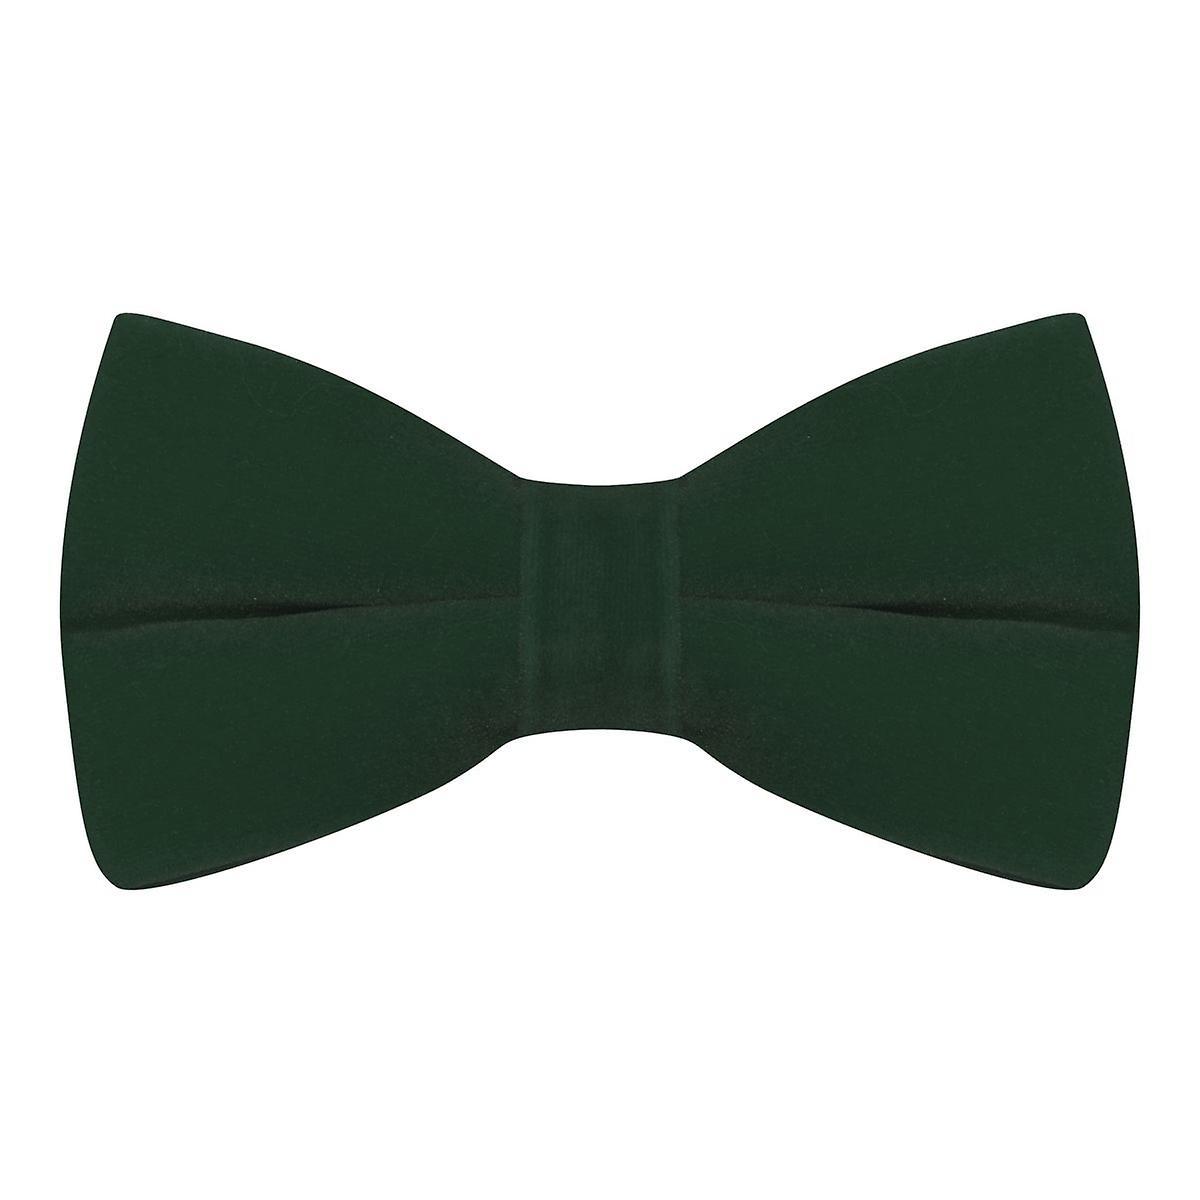 Luxury Dark Green Velvet Bow Tie